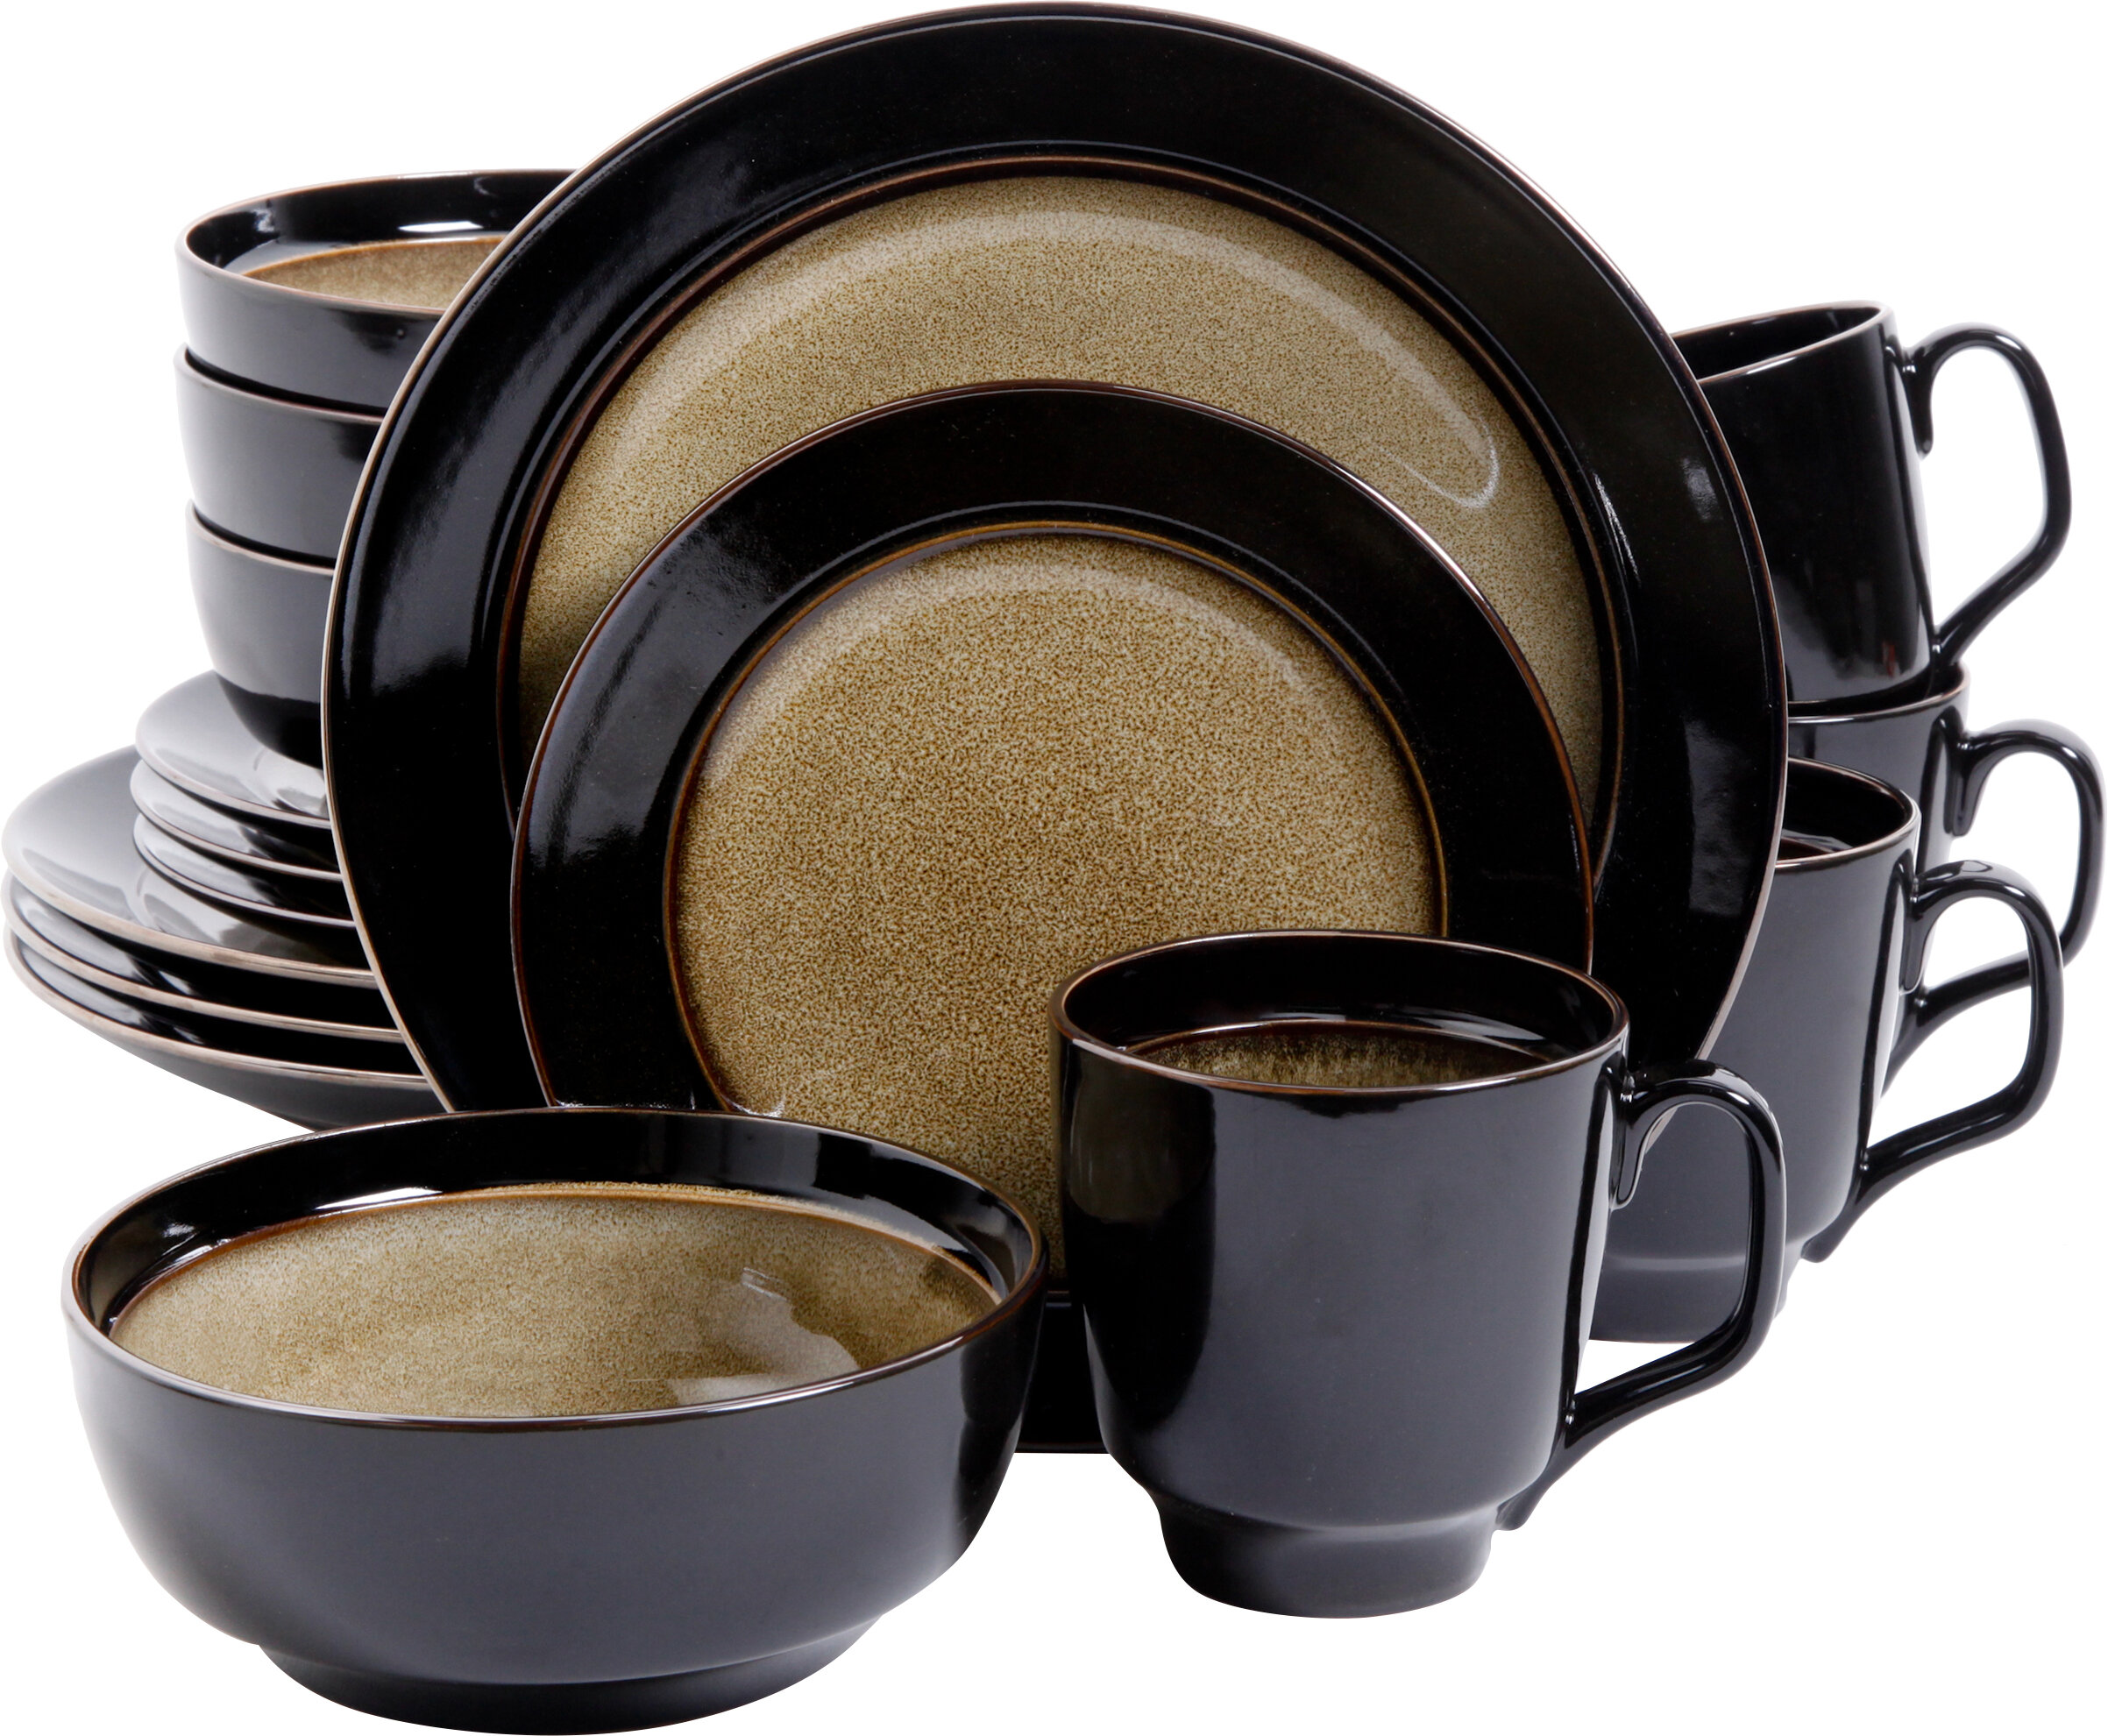 Mint Pantry Stoneware 16 Piece Dinnerware Set Service for 4 \u0026 Reviews | Wayfair  sc 1 st  Wayfair & Mint Pantry Stoneware 16 Piece Dinnerware Set Service for 4 ...